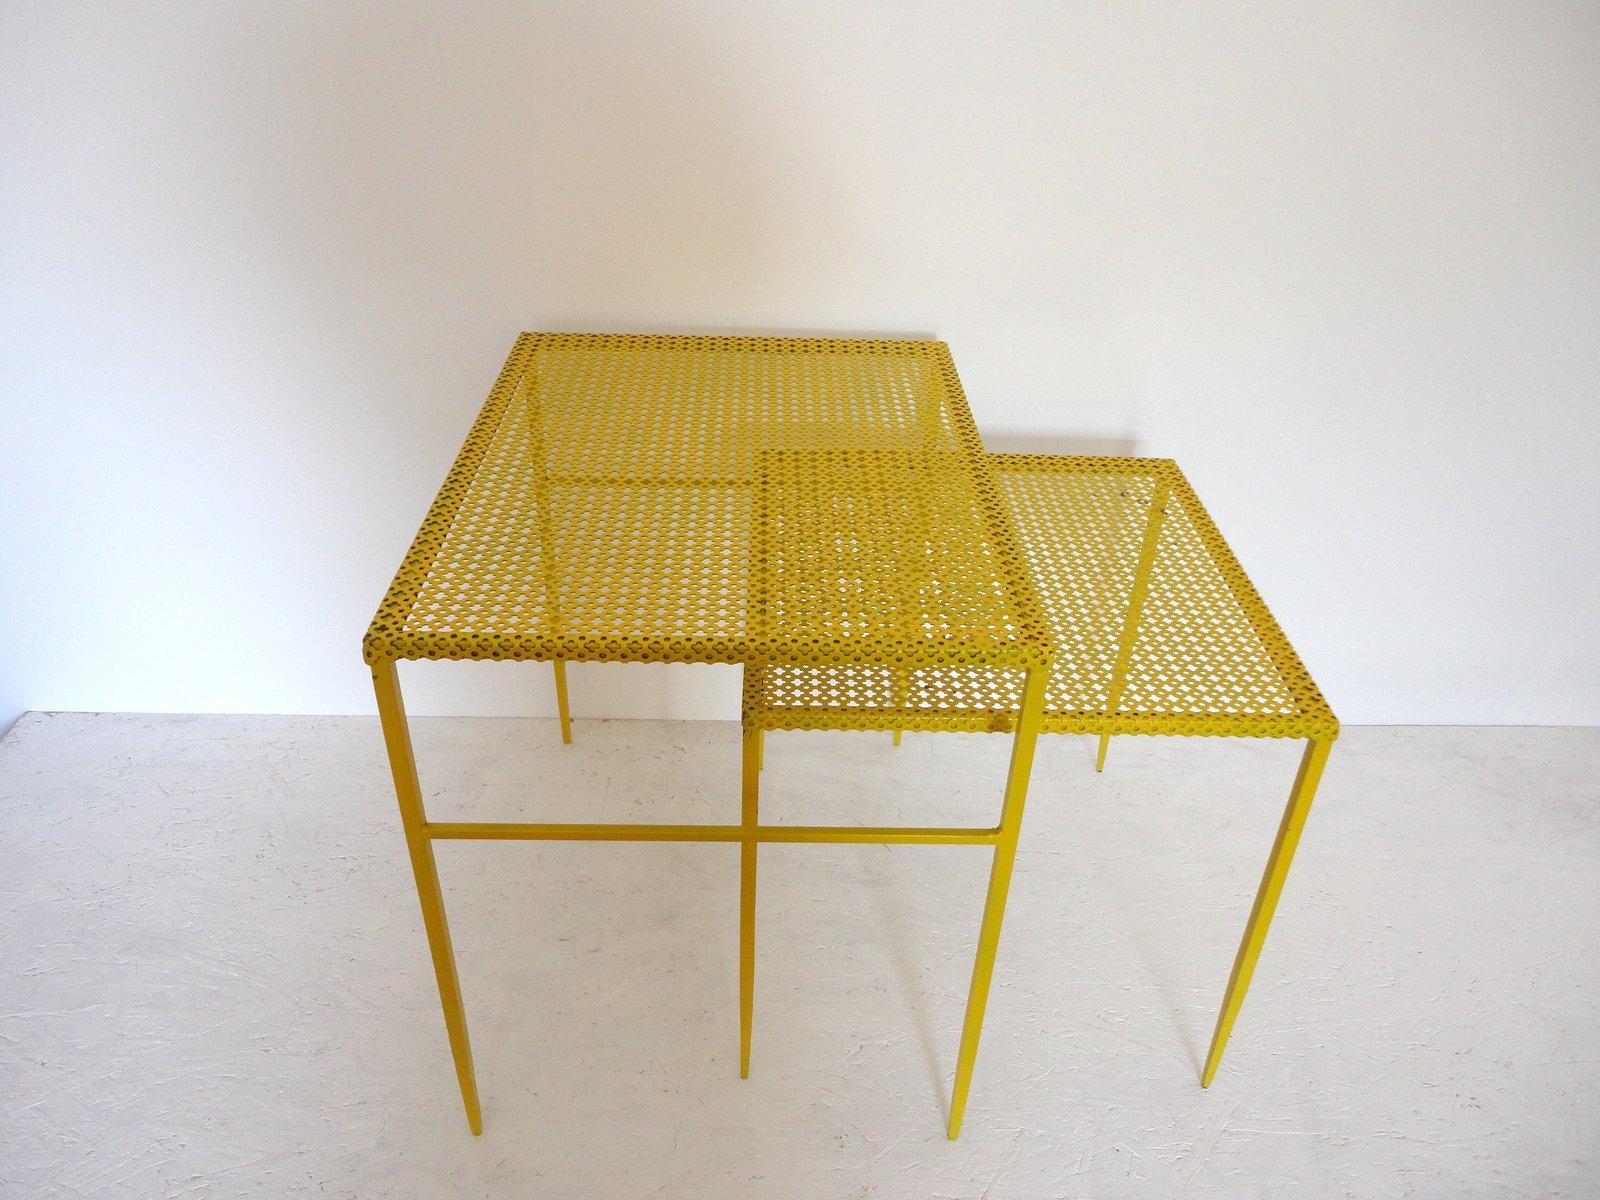 beistelltische aus metall von mathieu mategot 1950er 2er. Black Bedroom Furniture Sets. Home Design Ideas